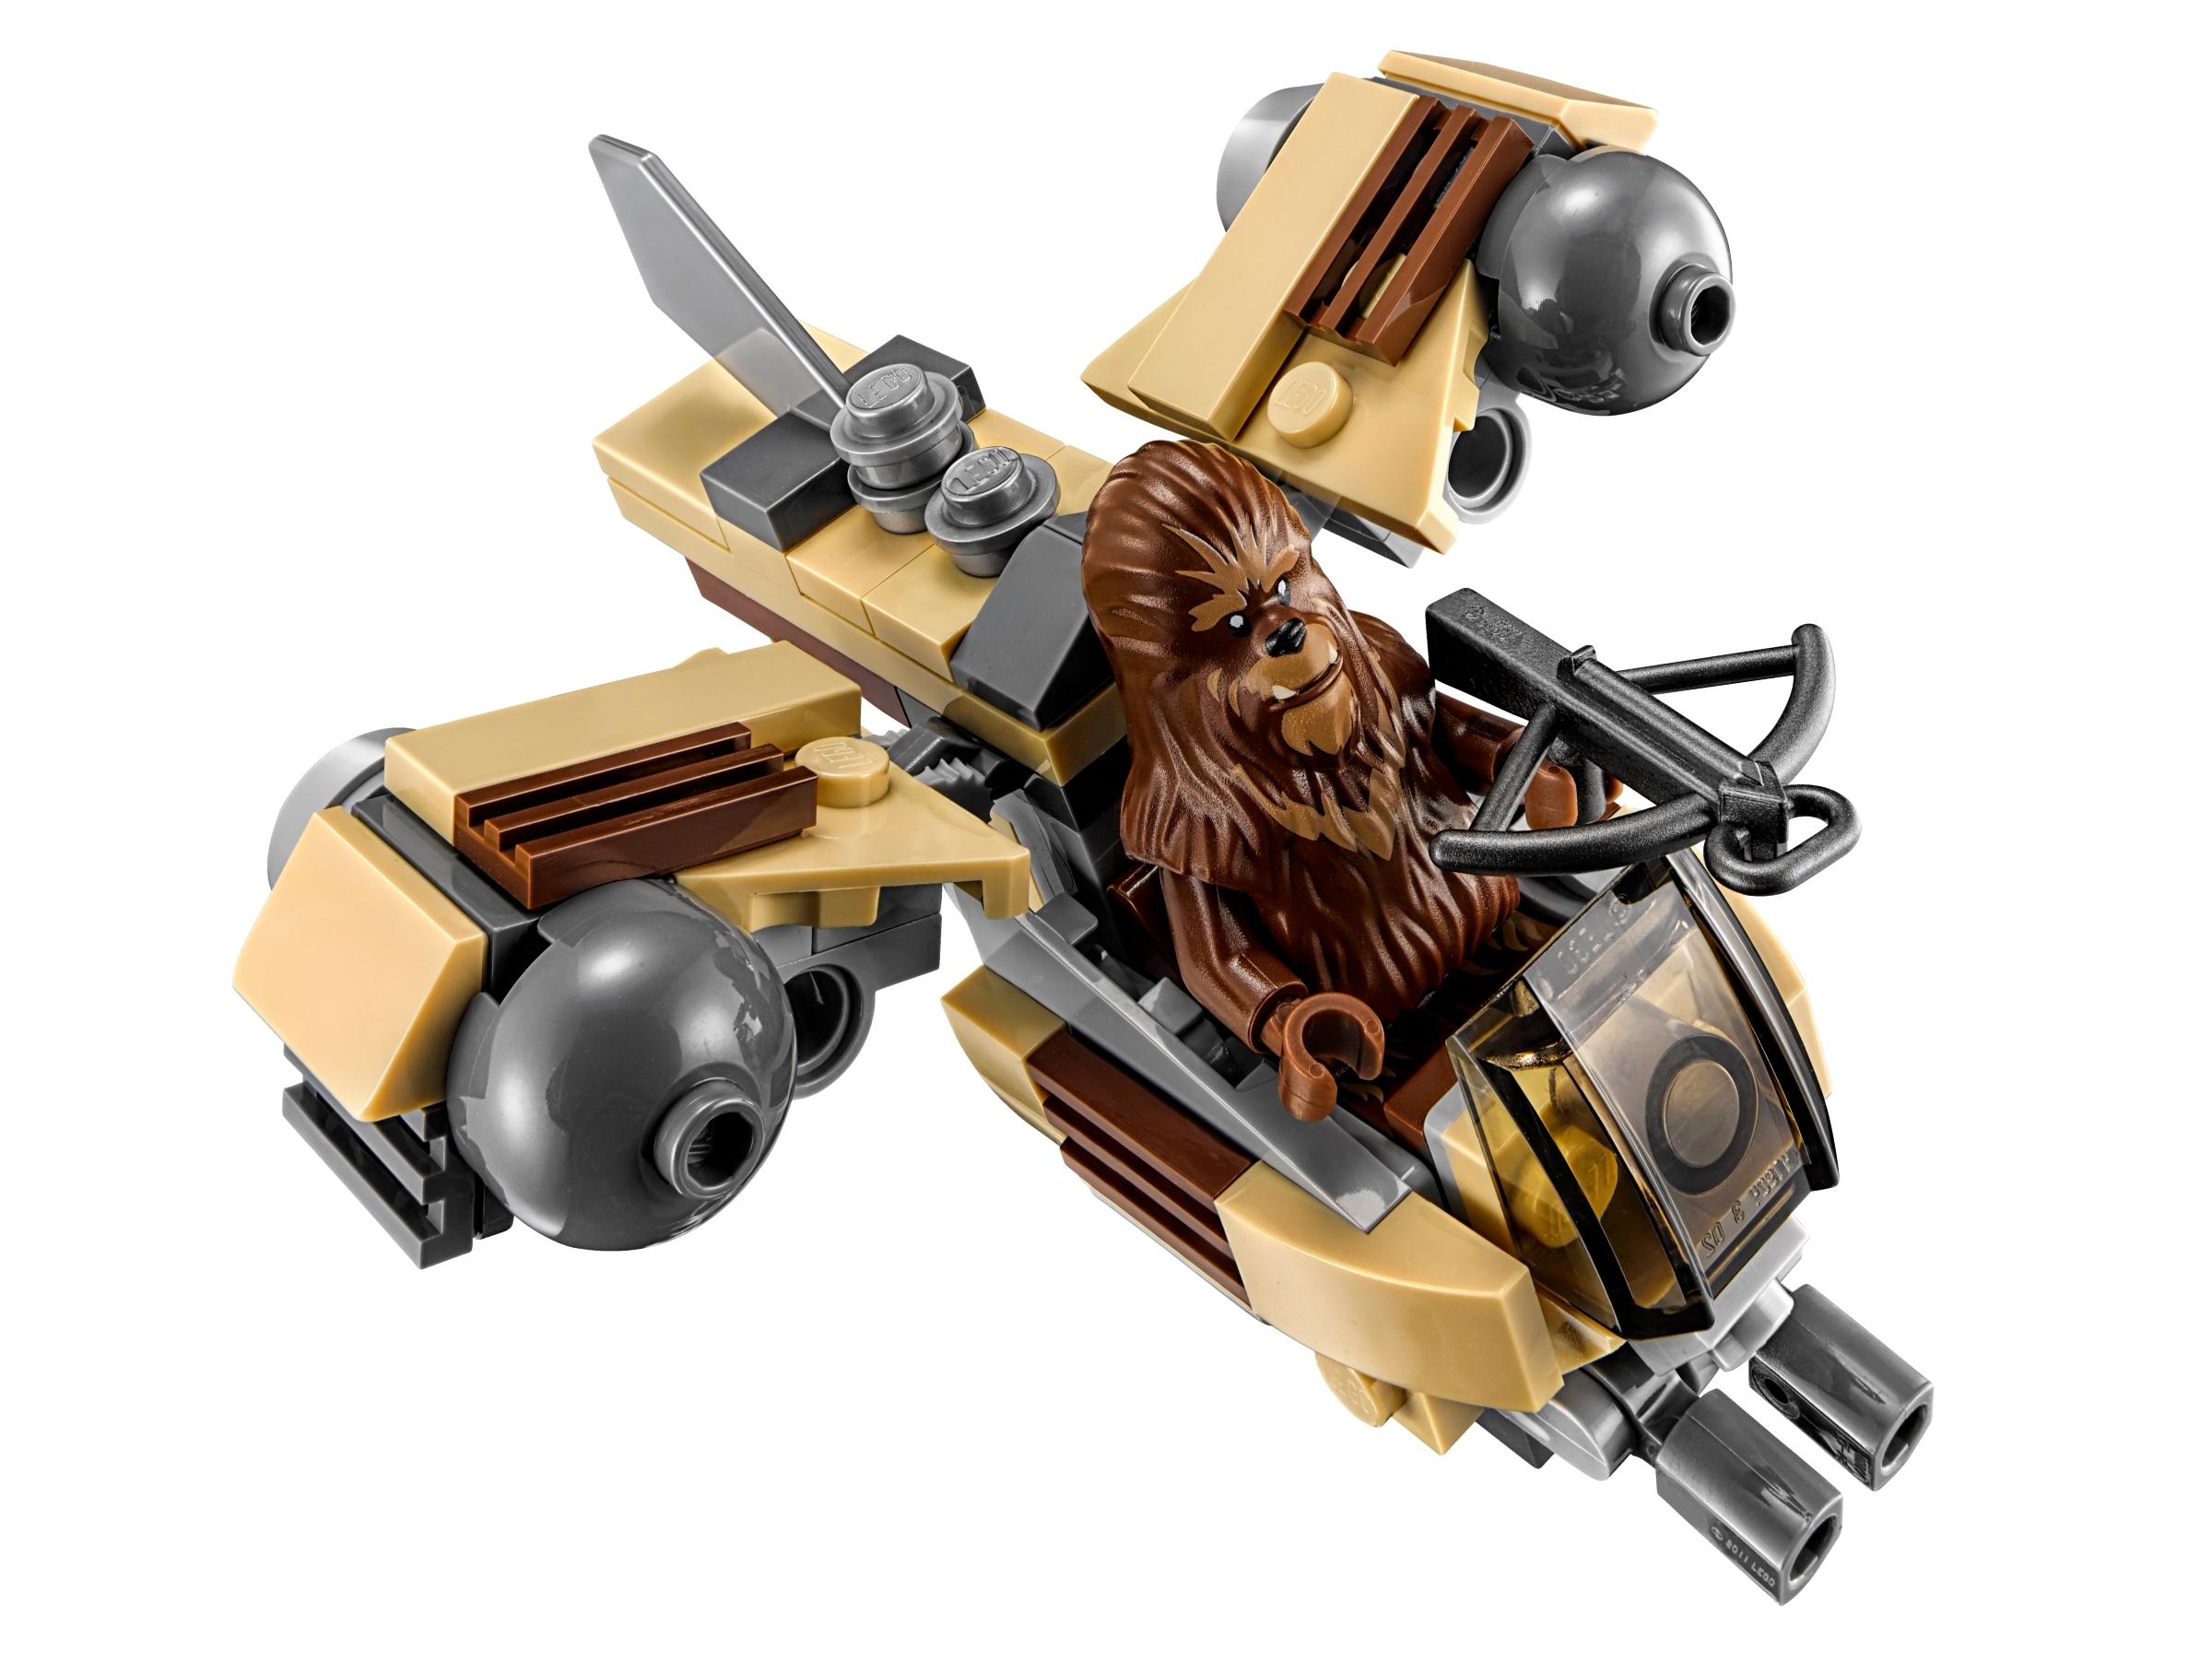 Lego Wookiee 75129 Gunship Chewbacca Star Wars Minifigure